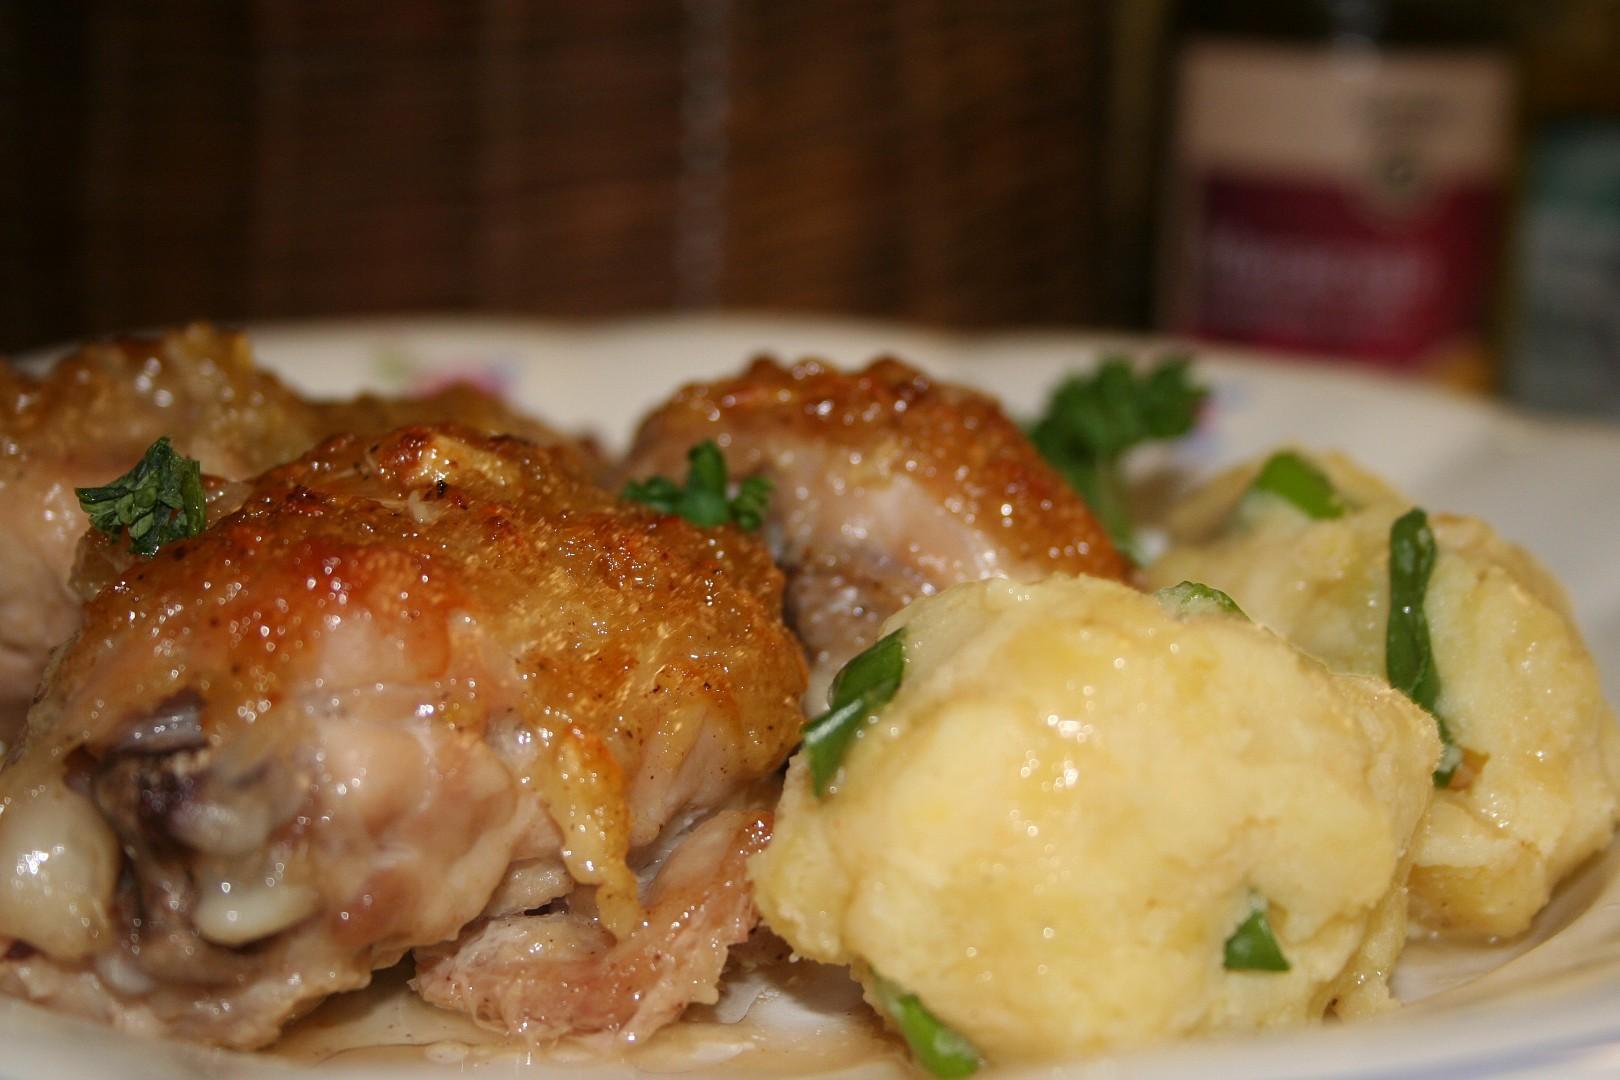 Kuře s česnekem a džemem recept